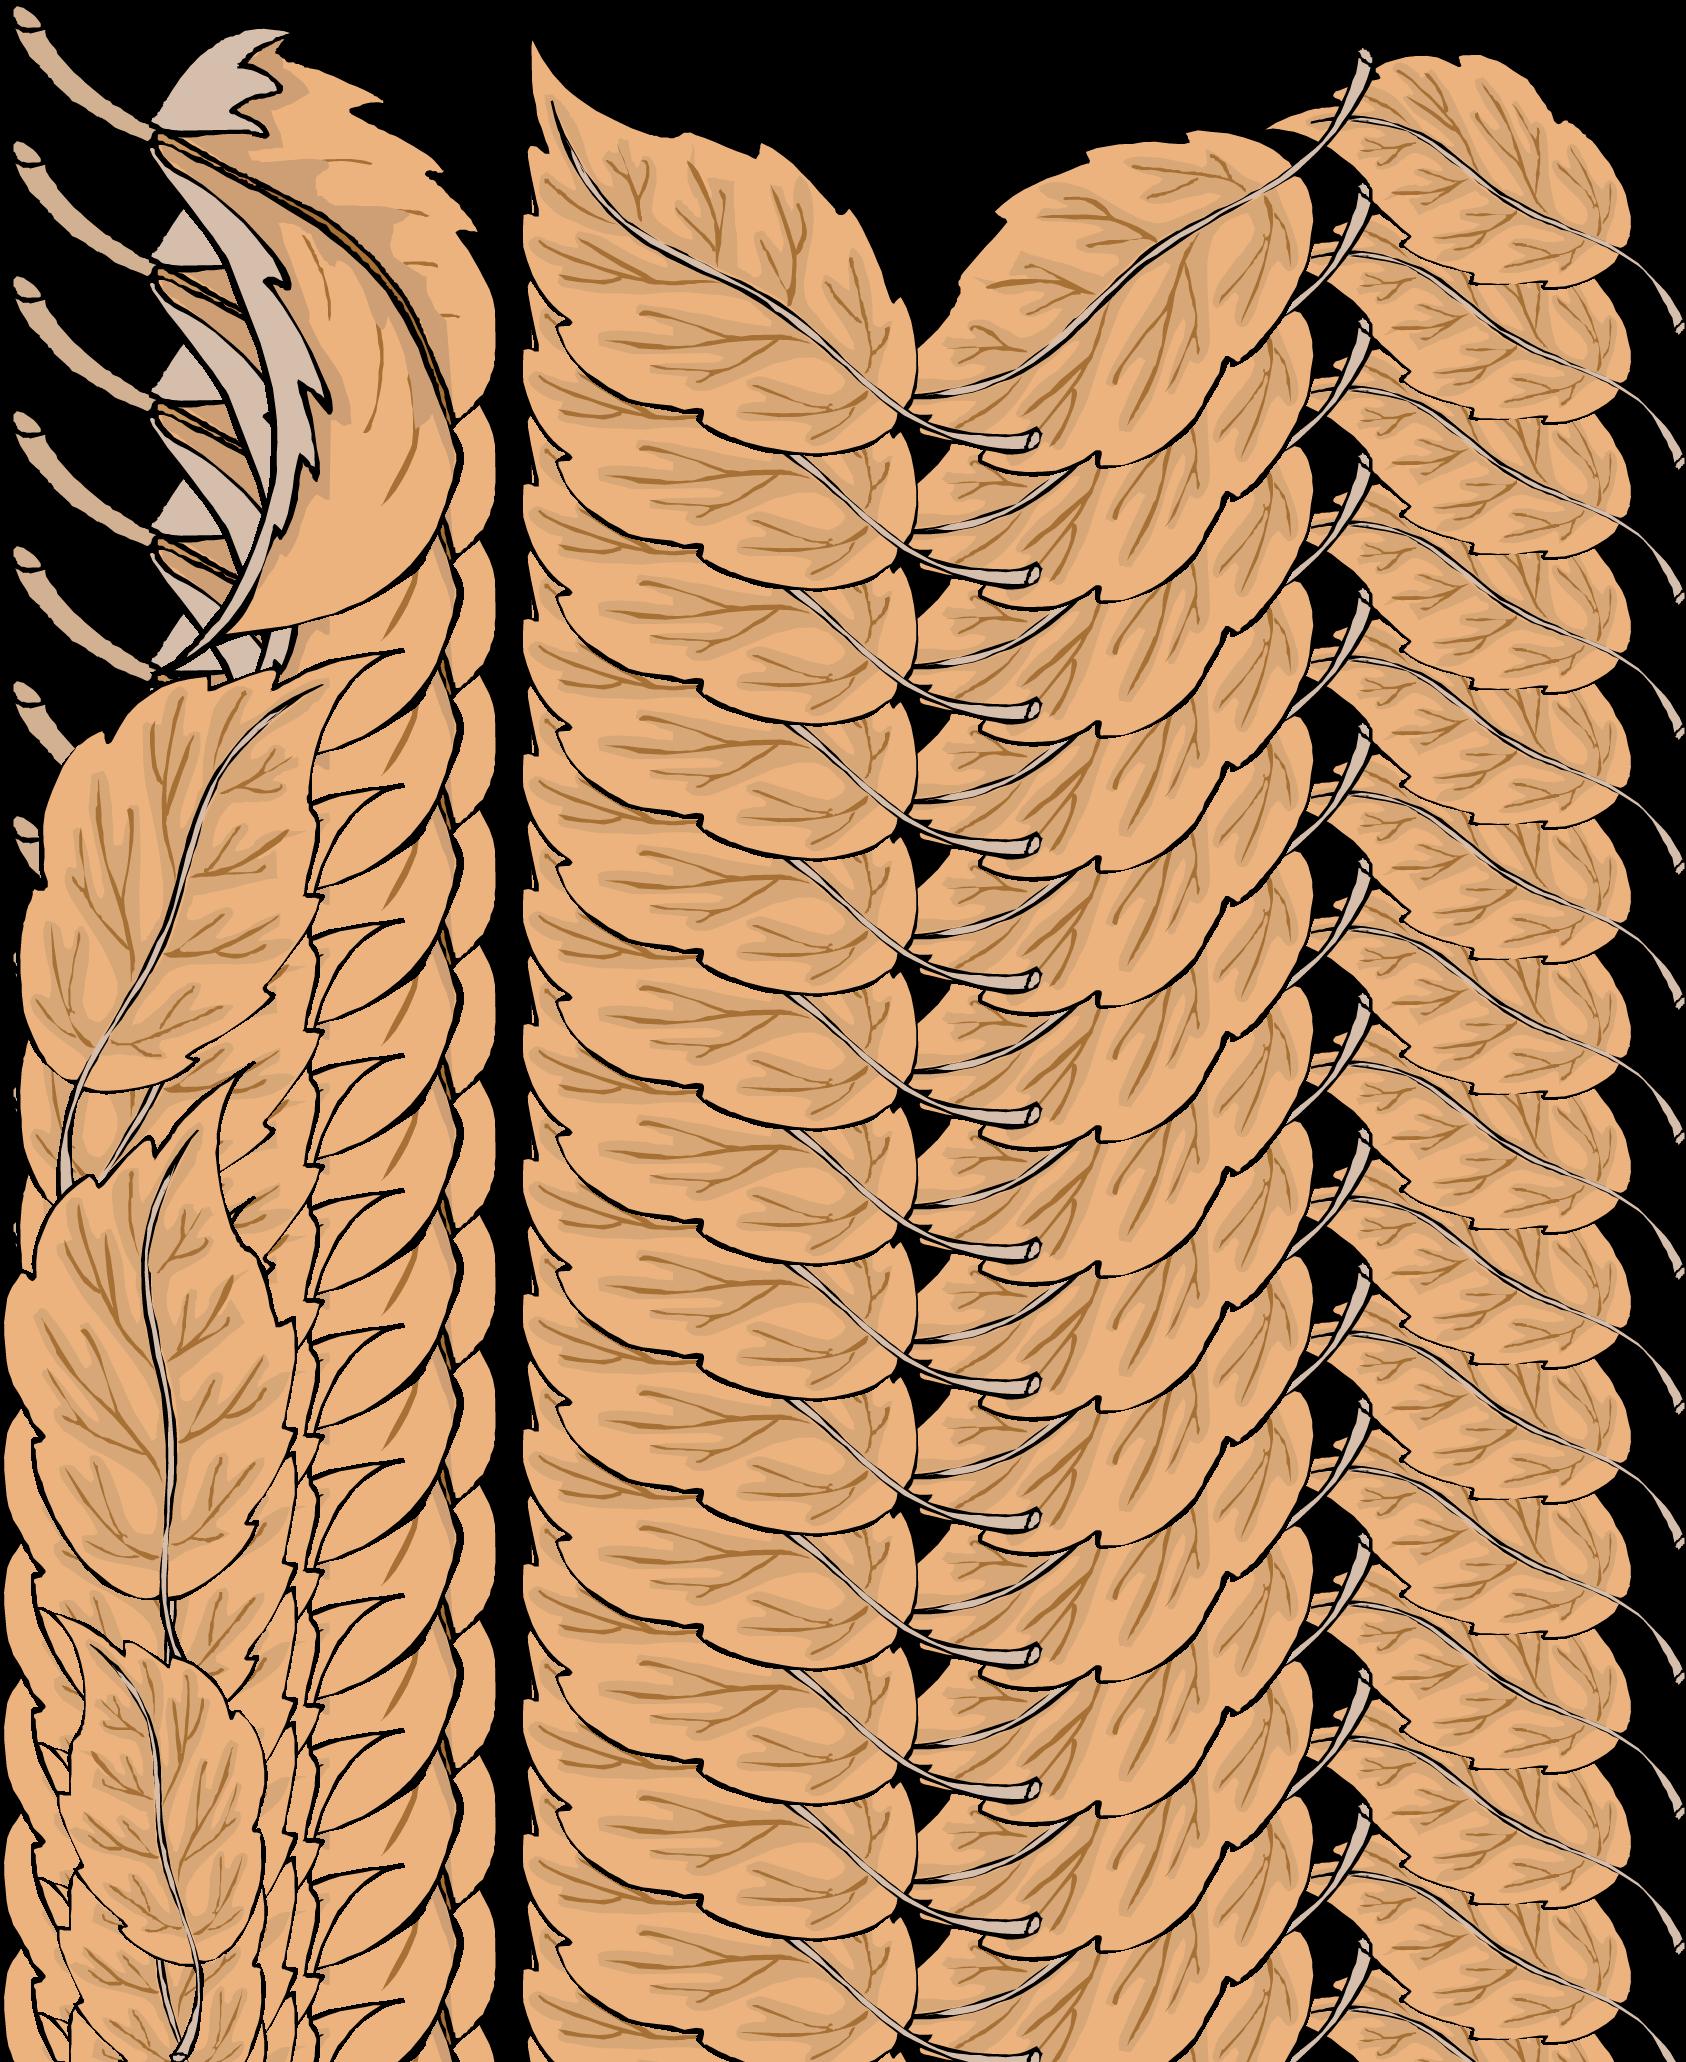 Boarder clipart classy. Leaf border cilpart design